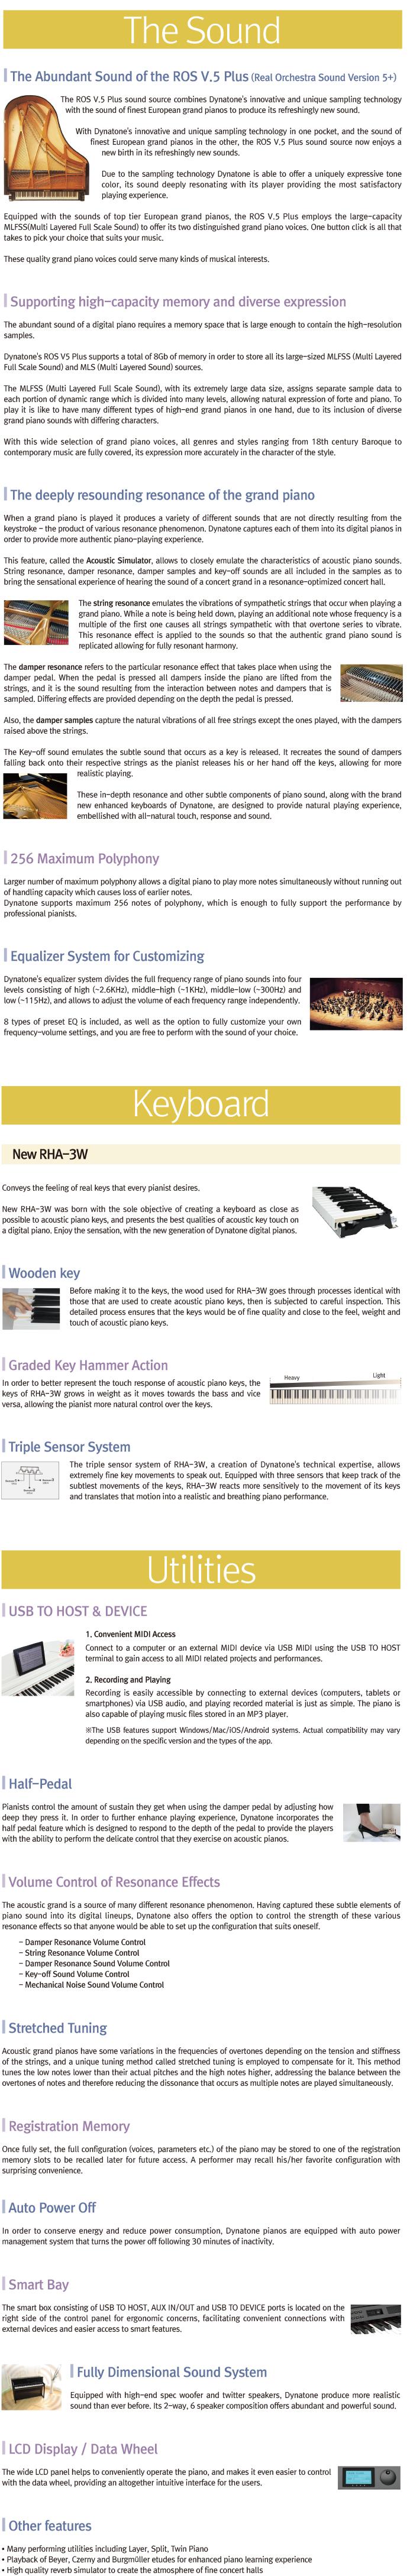 مشخصات پیانوی دیجیتال دایناتون مدل DPR-3500